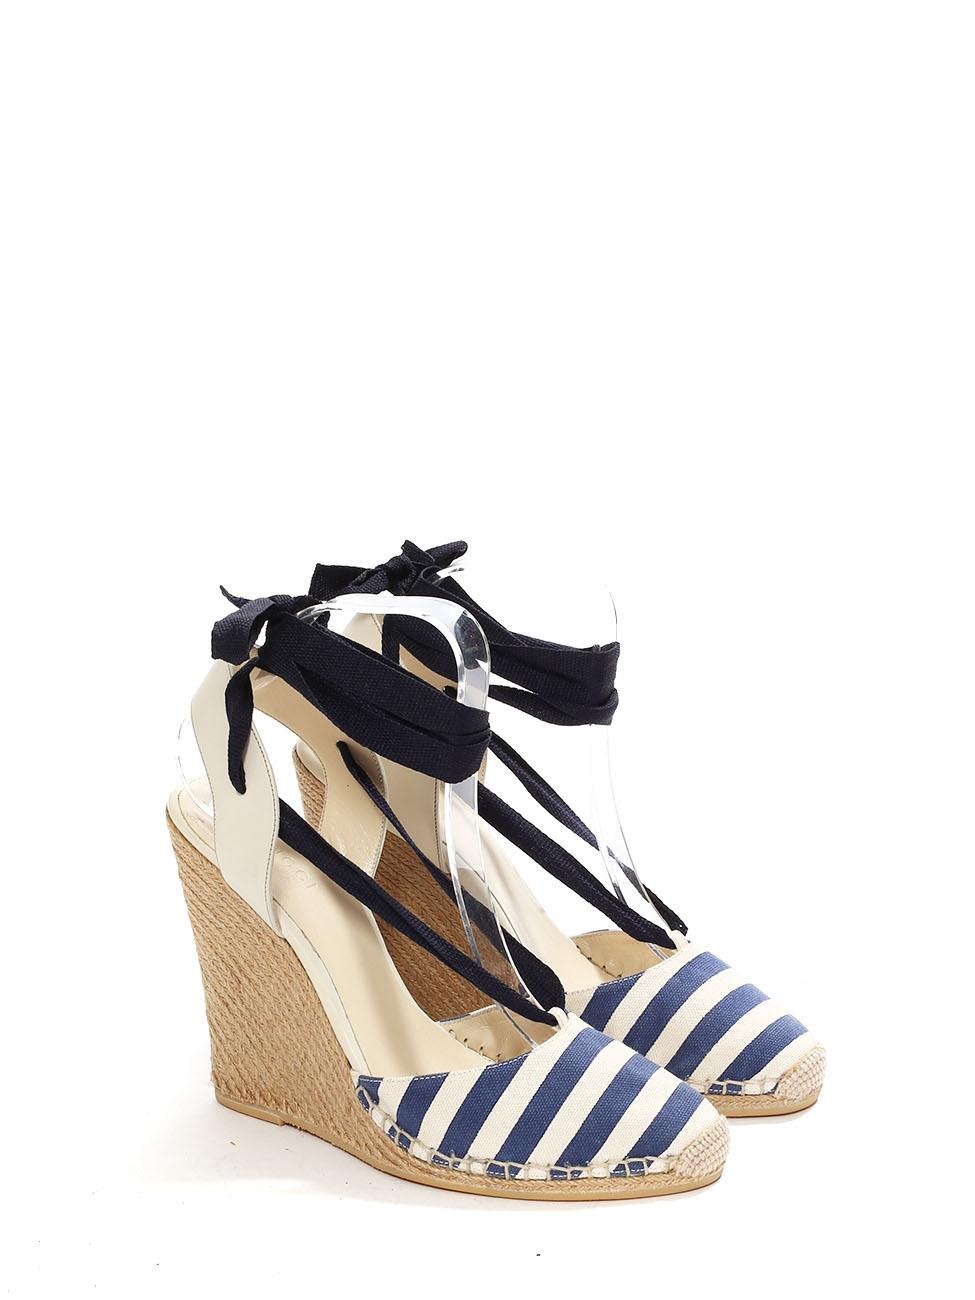 2d94c8c4f ... Sandals Retail 450 Size 38 5. Louise Paris Gucci Ivory White And Navy  Blue Striped Canvas